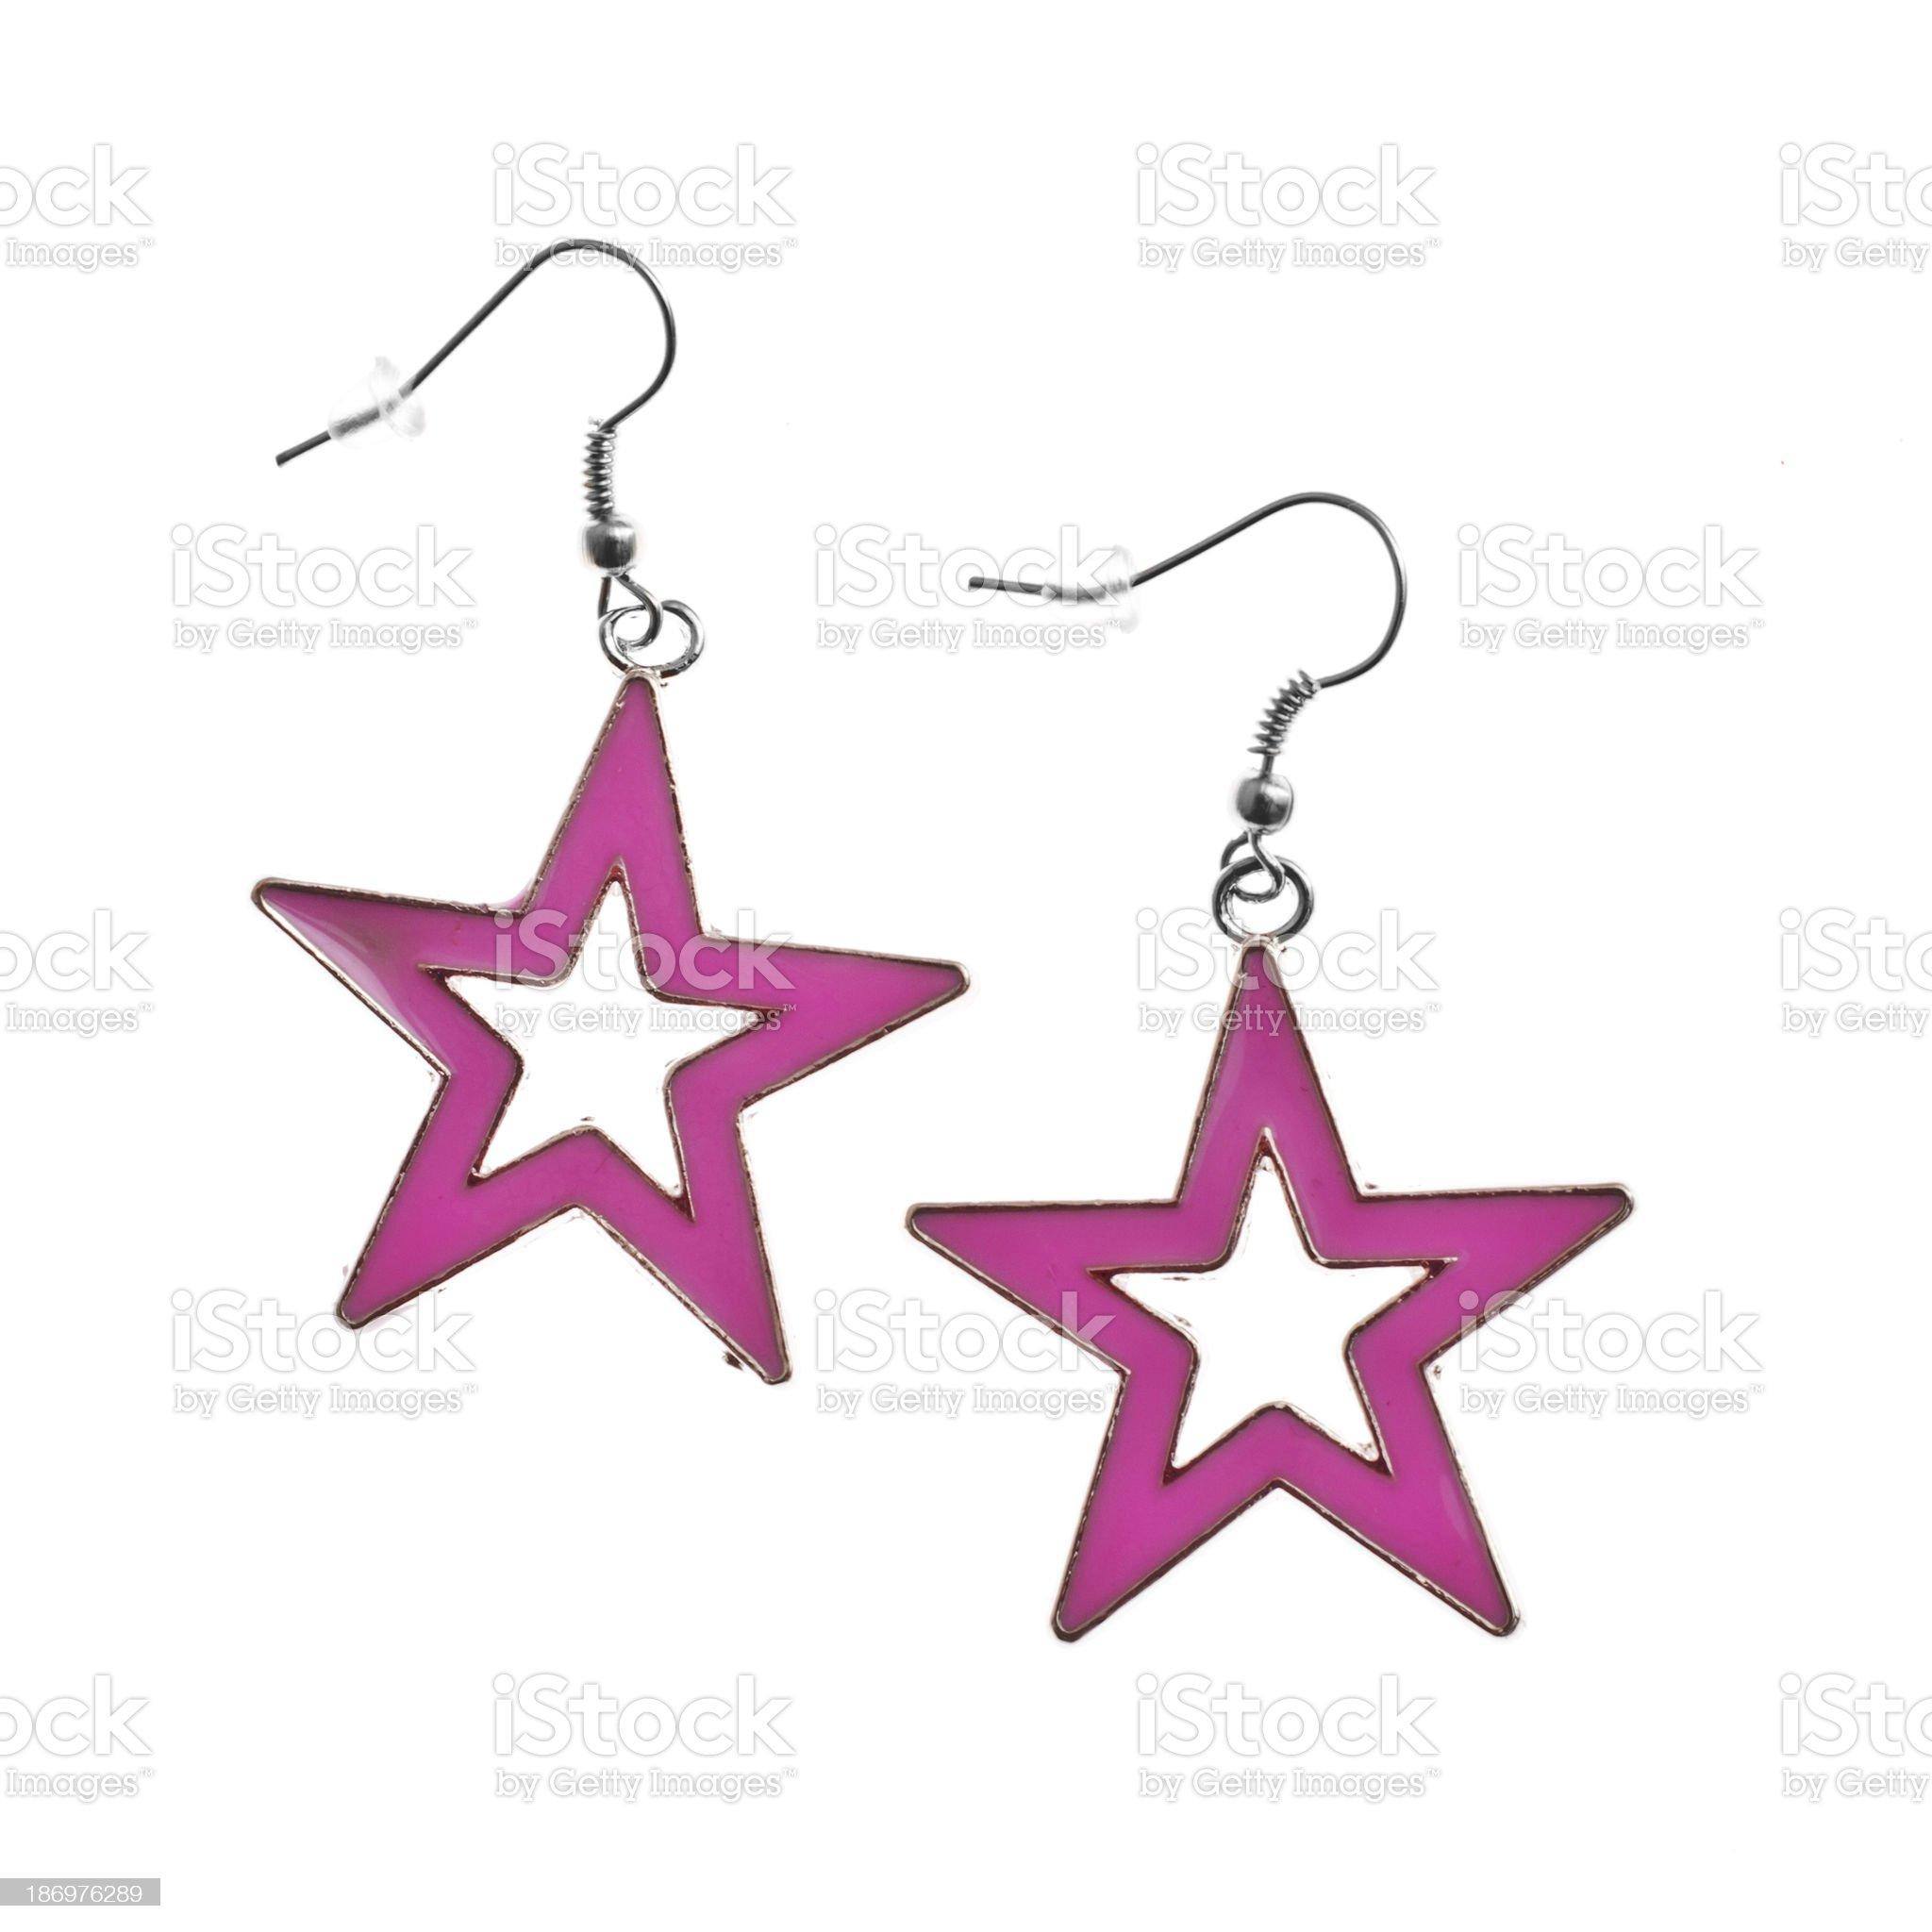 Star Earrings royalty-free stock photo